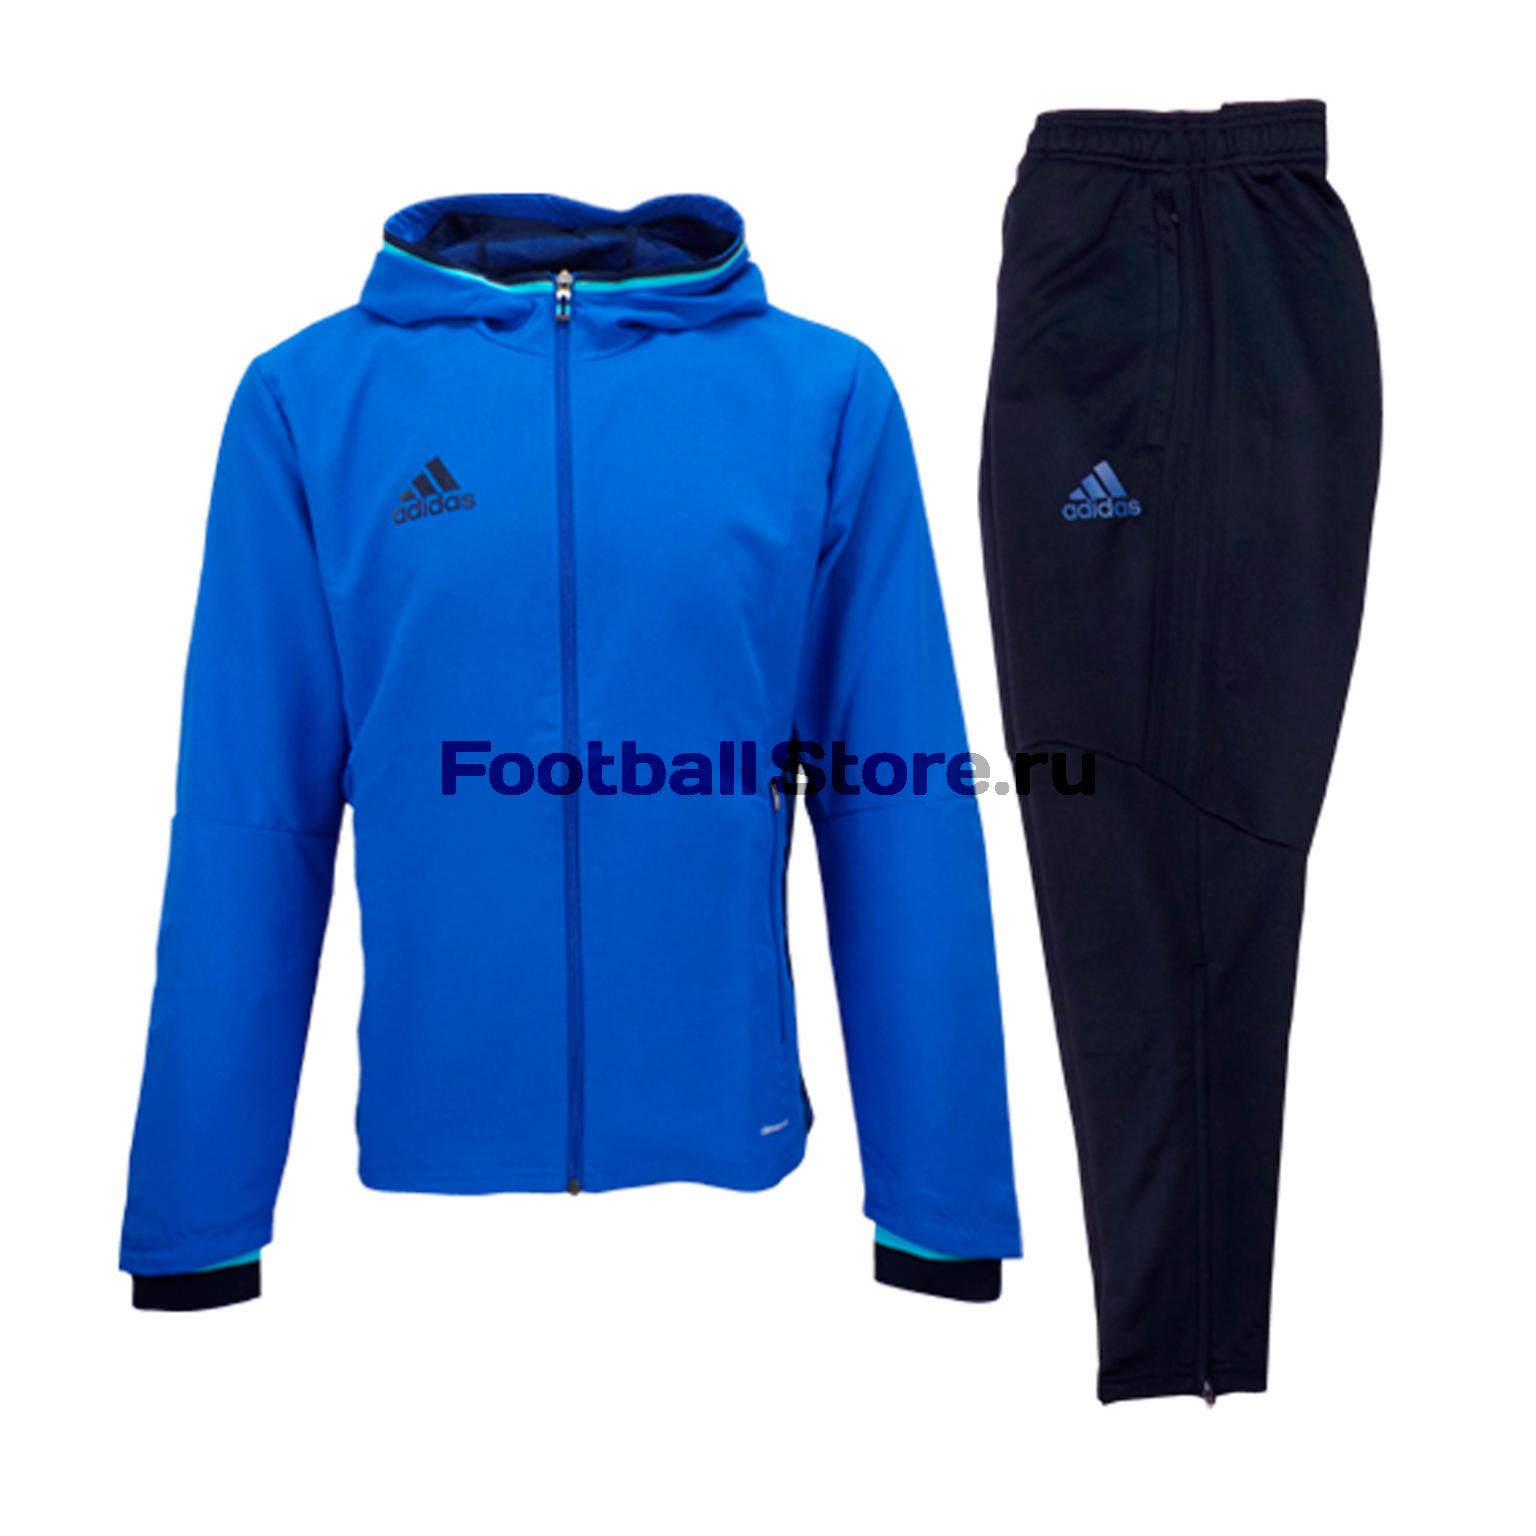 Костюм спортивный Adidas Con16 Pre Suit AB3059